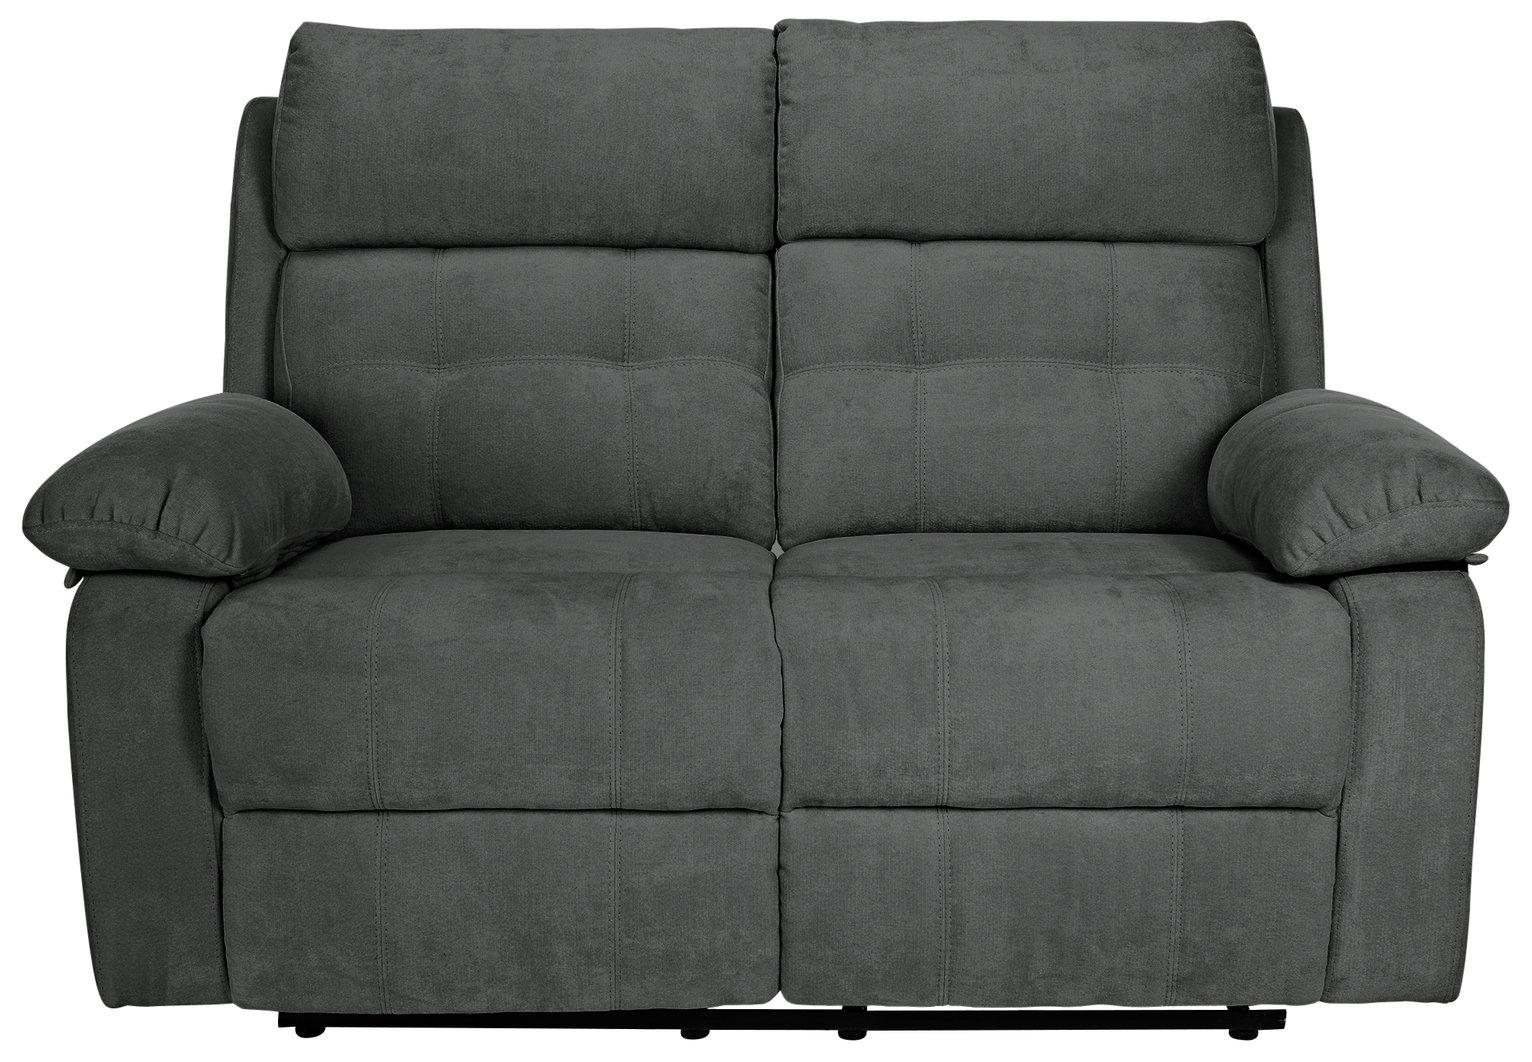 Incroyable Buy Argos Home June 2 Seater Fabric Recliner Sofa   Charcoal   Sofas   Argos